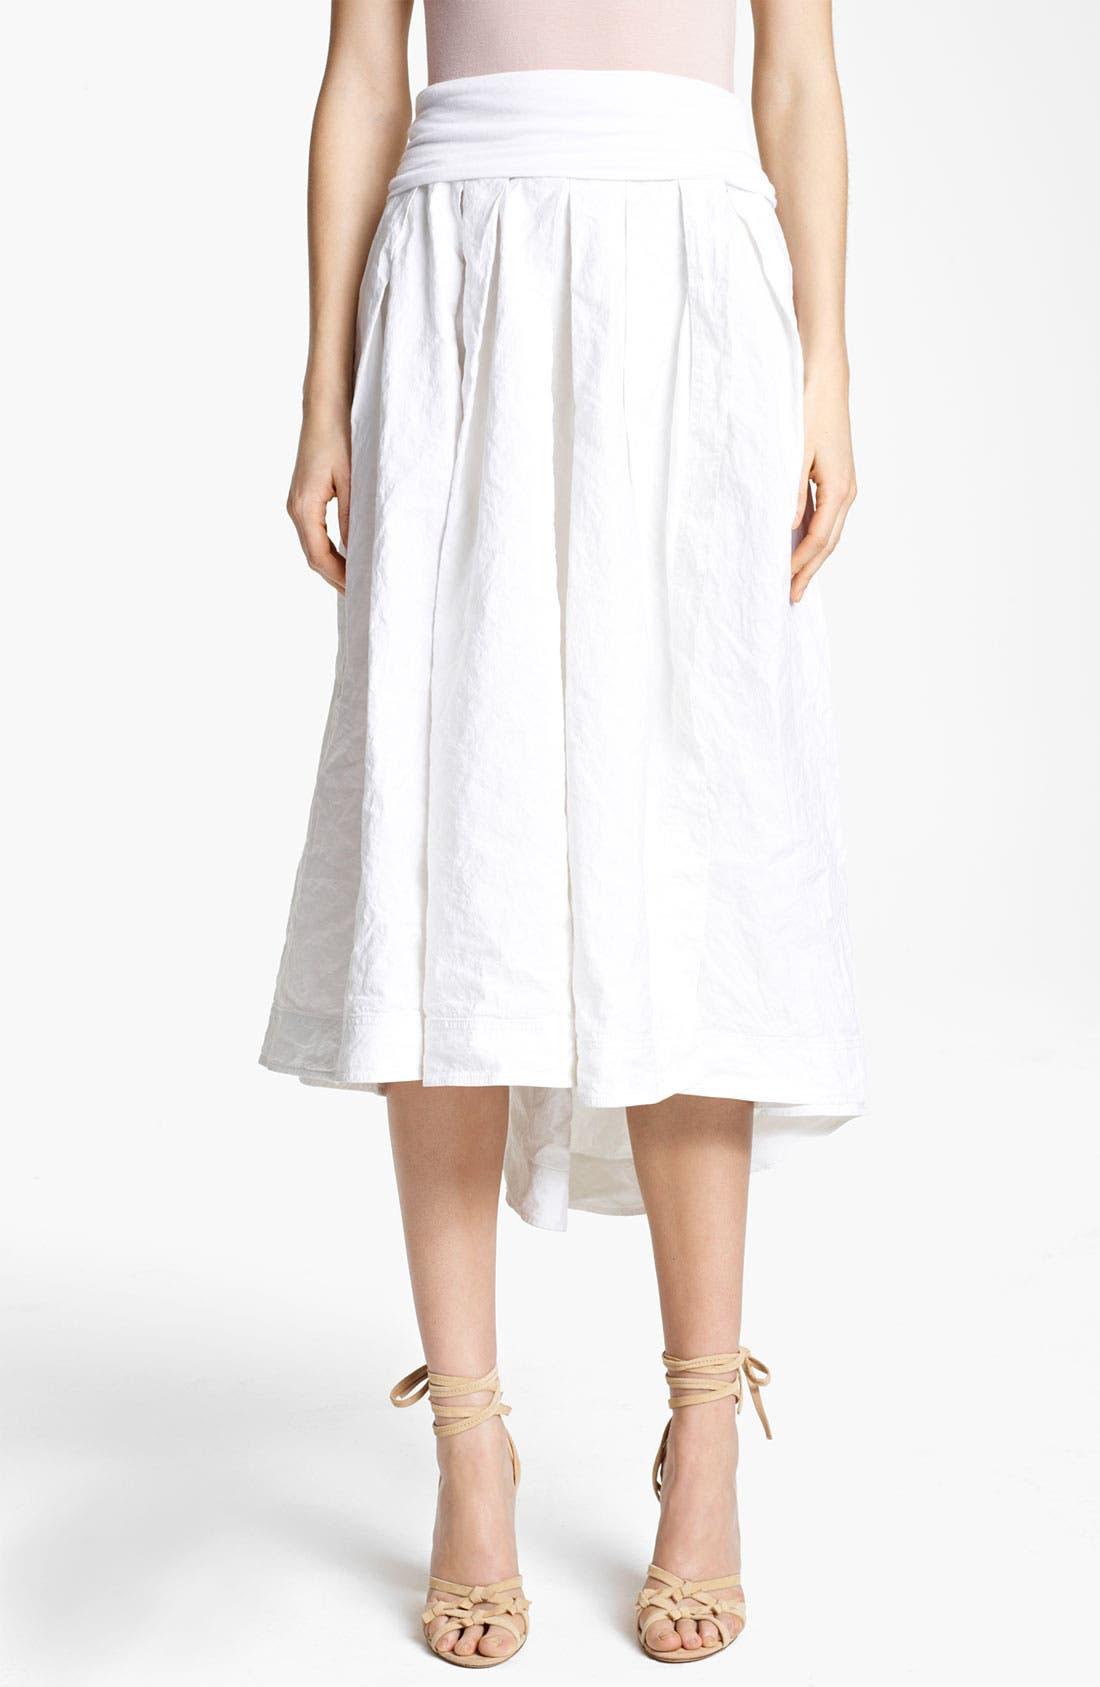 Alternate Image 1 Selected - Donna Karan Collection Parachute Cotton Skirt